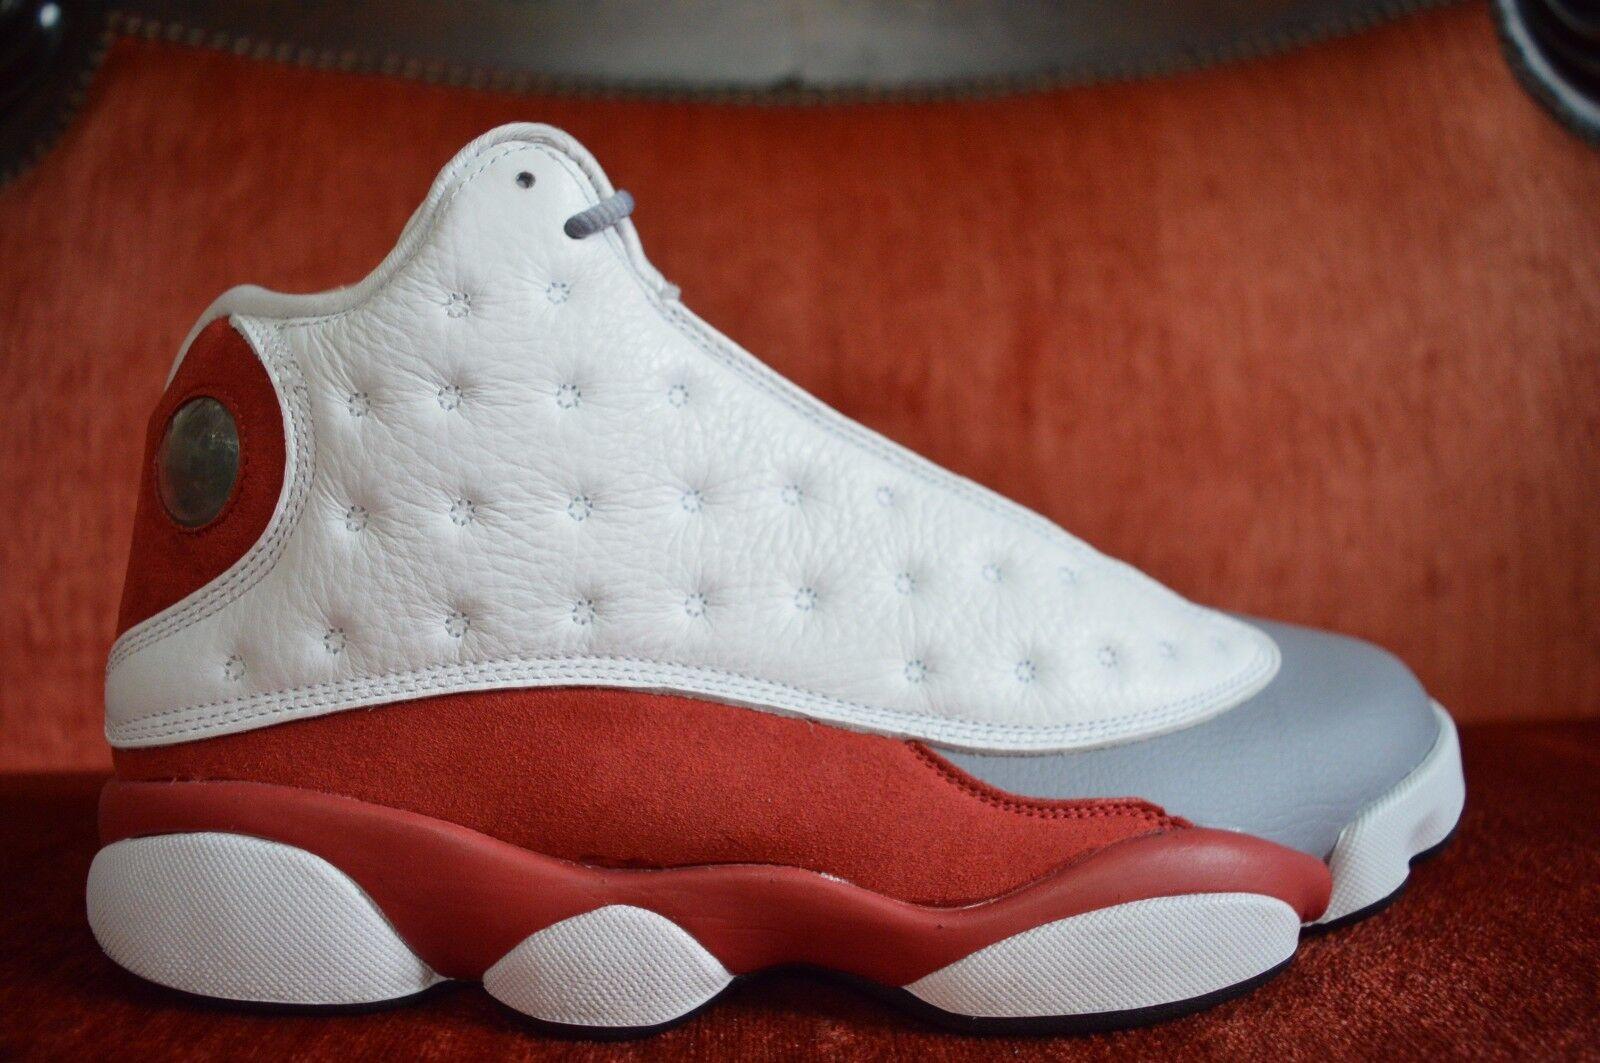 CLEAN Nike Air Jordan 13 Retro Grey Toe 2014 Size 9 414571-126 VNDS OG ALL